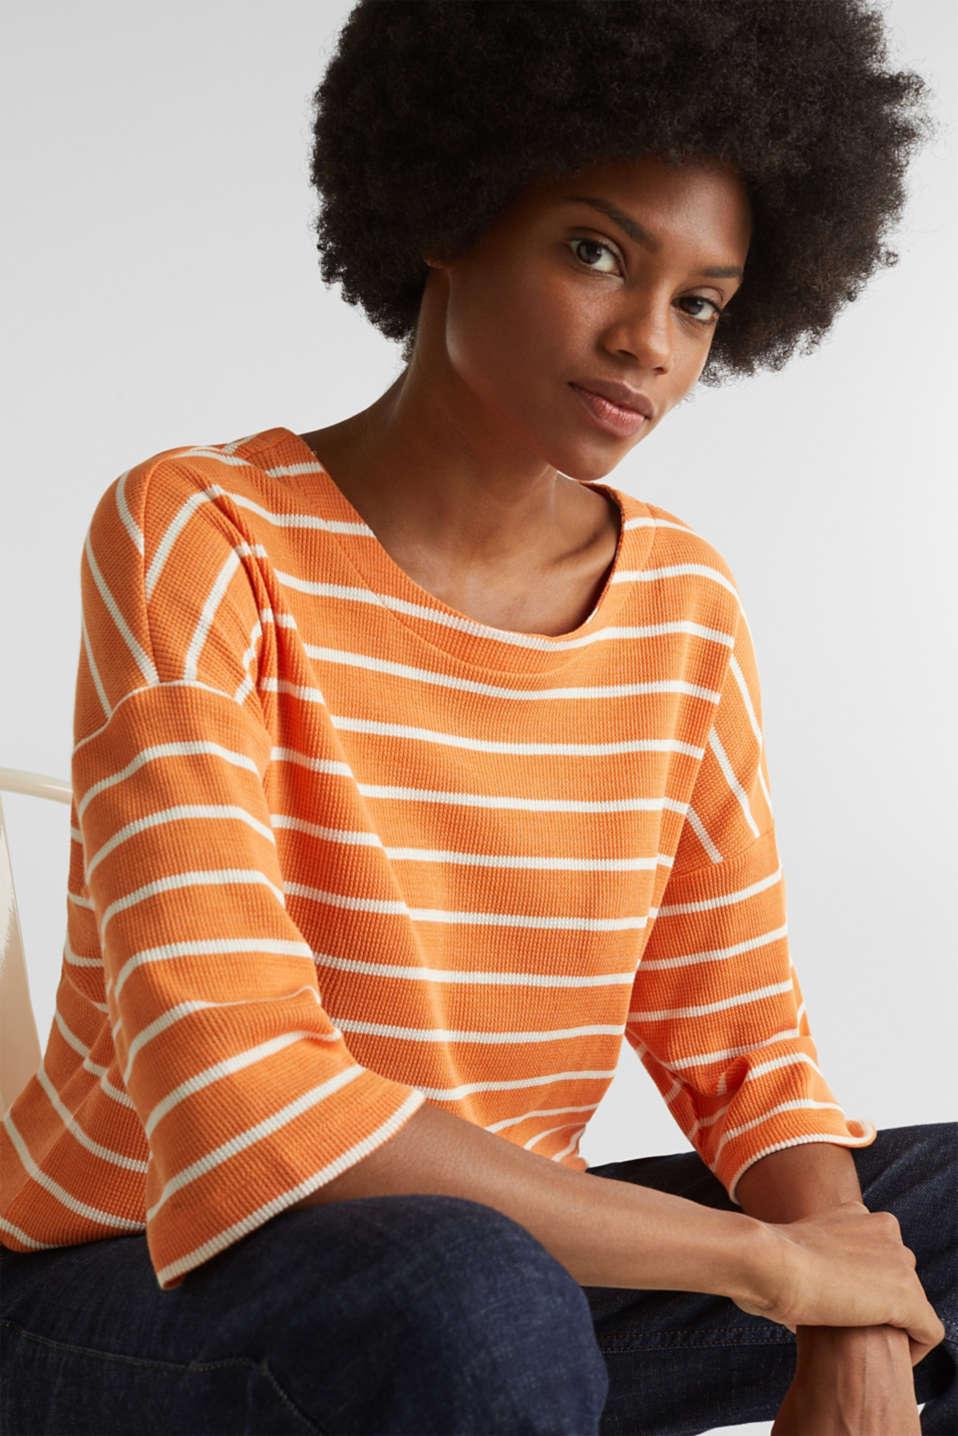 Piqué T-shirt in 100% cotton, RUST ORANGE, detail image number 7